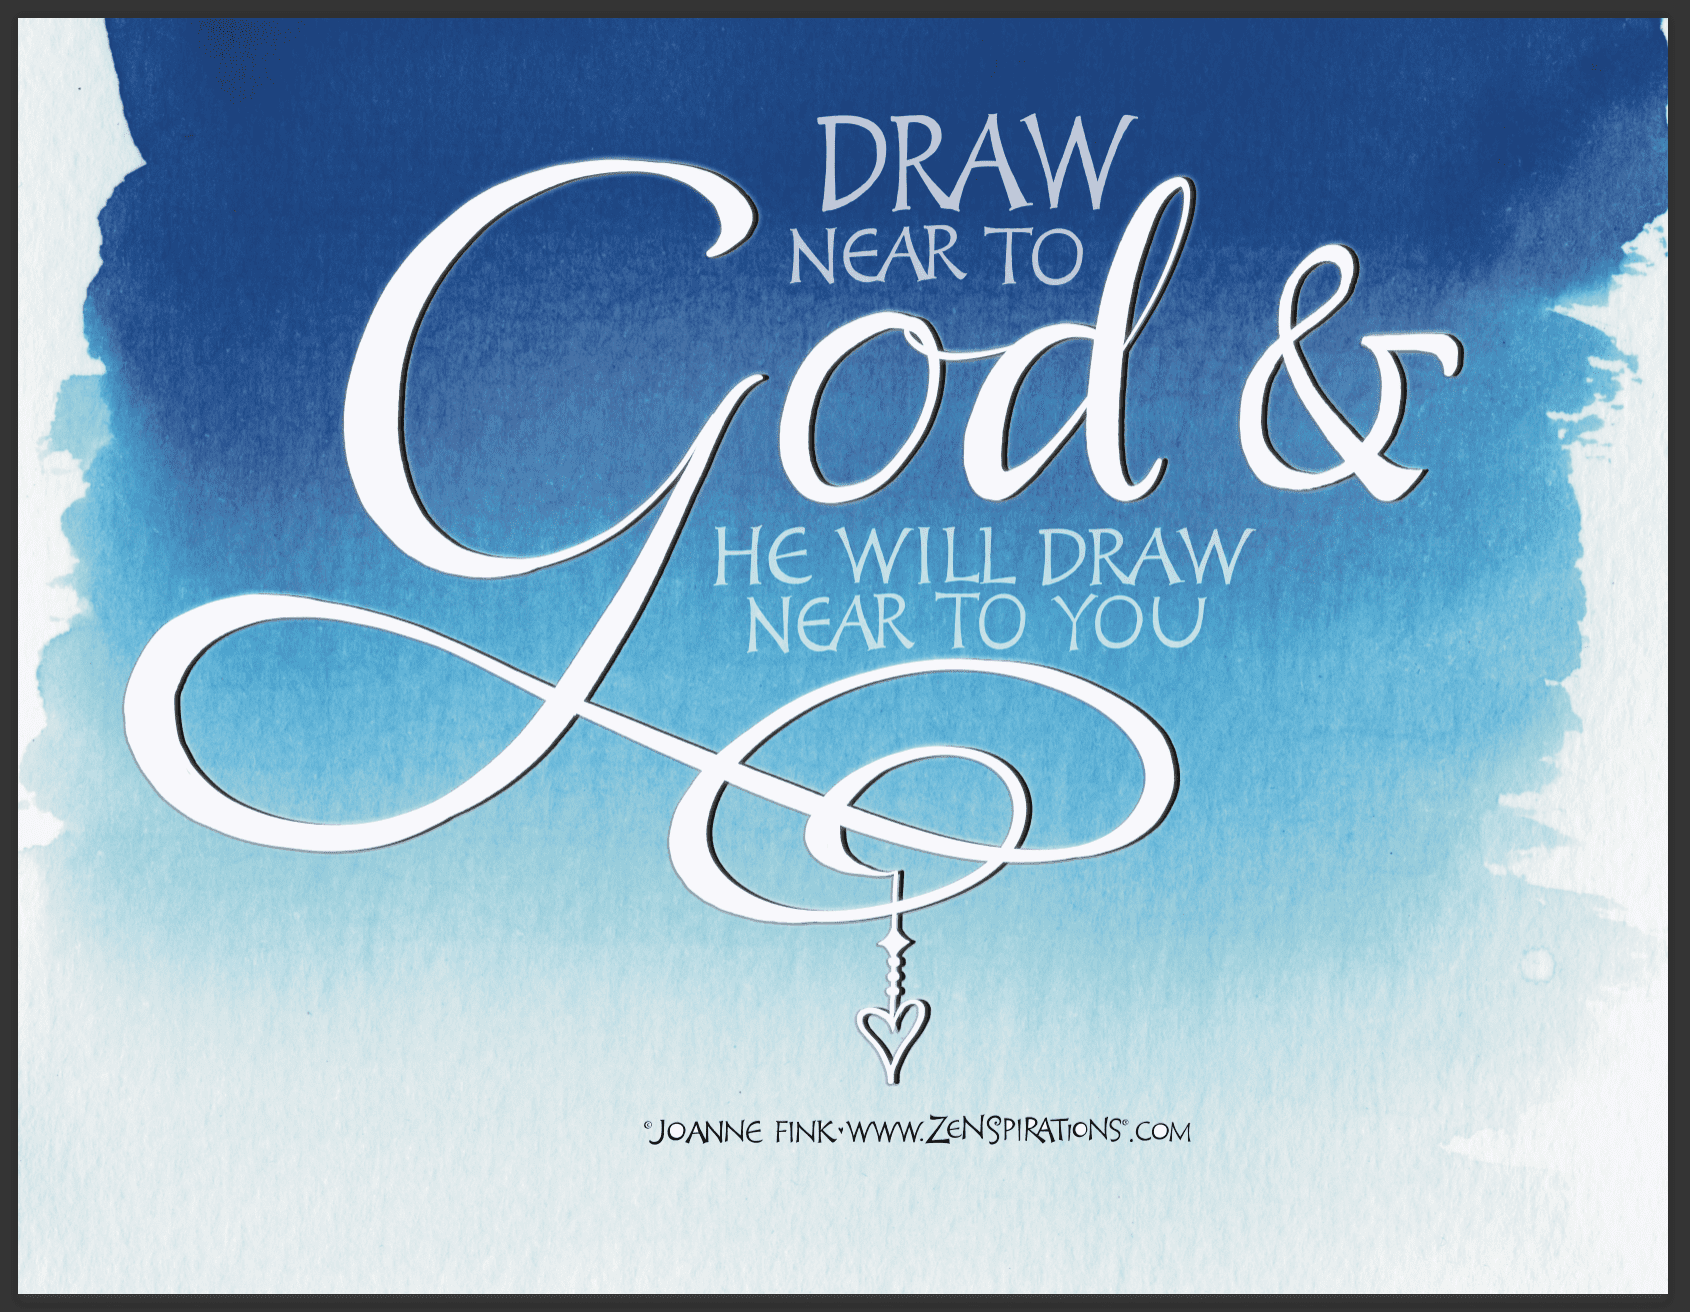 zenspirations_by_joanne_fink_12_12_16_blog_draw_near_to_god